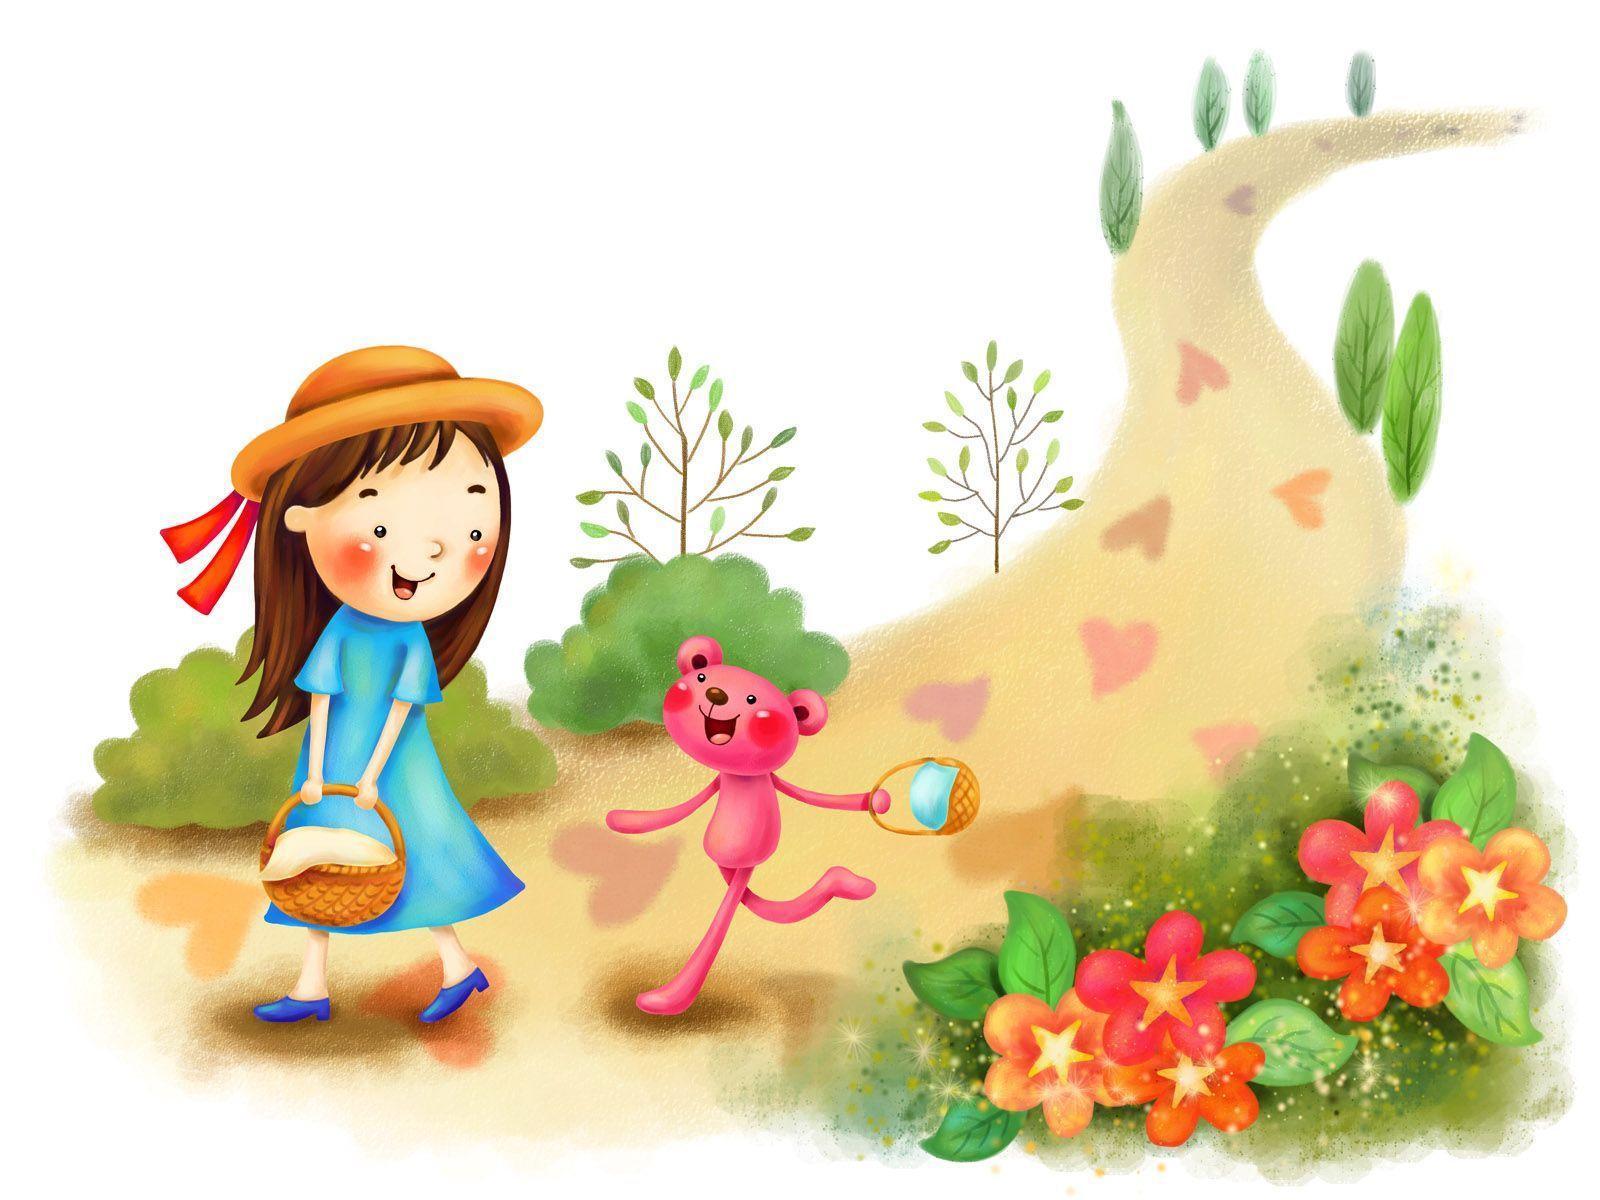 Wallpapers Of Cute Cartoon - Wallpaper Cave